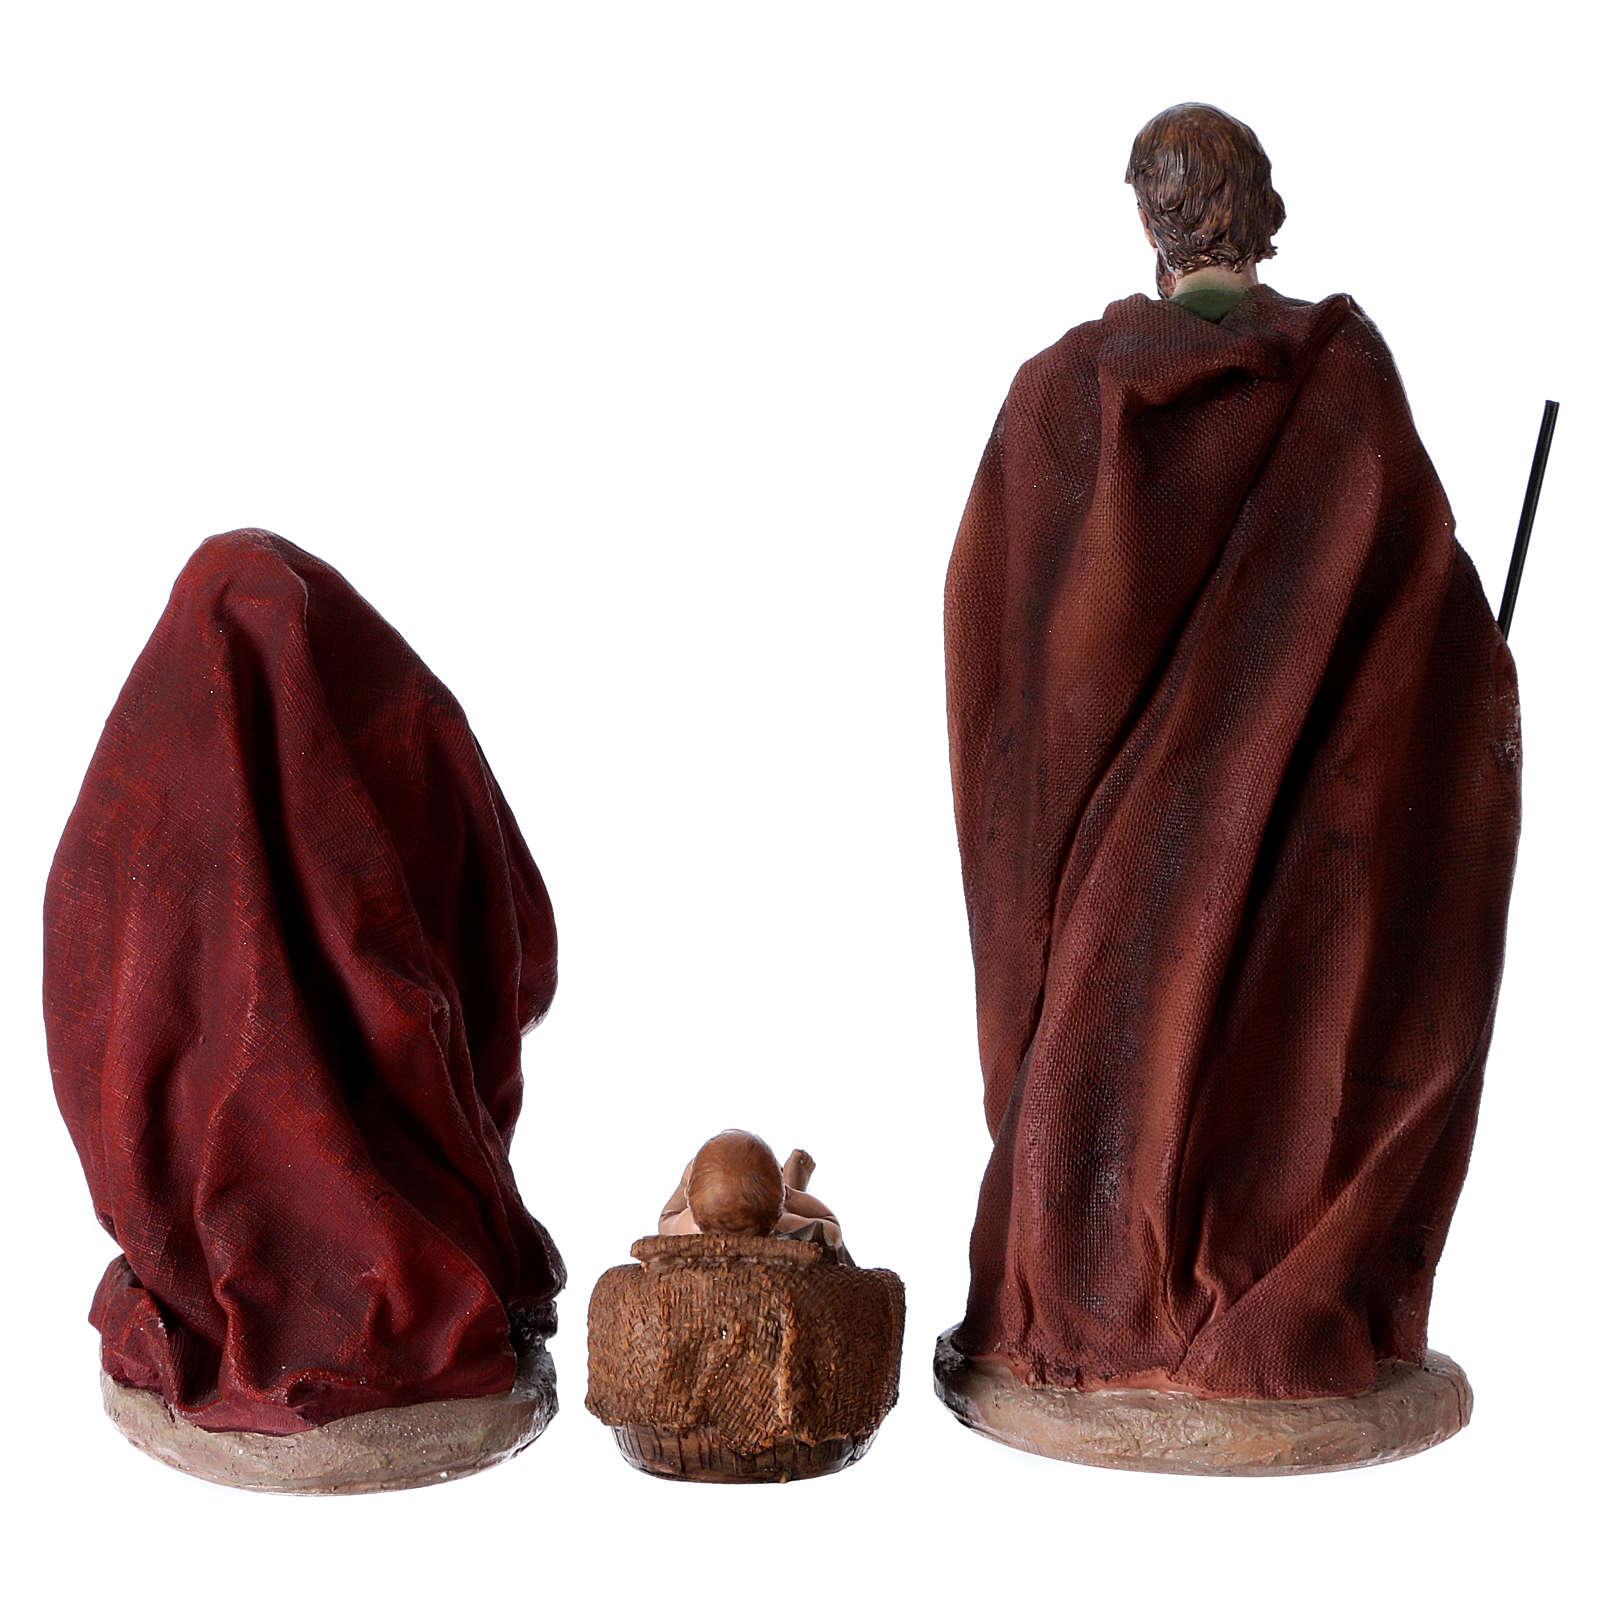 Colored Nativity Scene 28 cm, set of 8 figurines 4